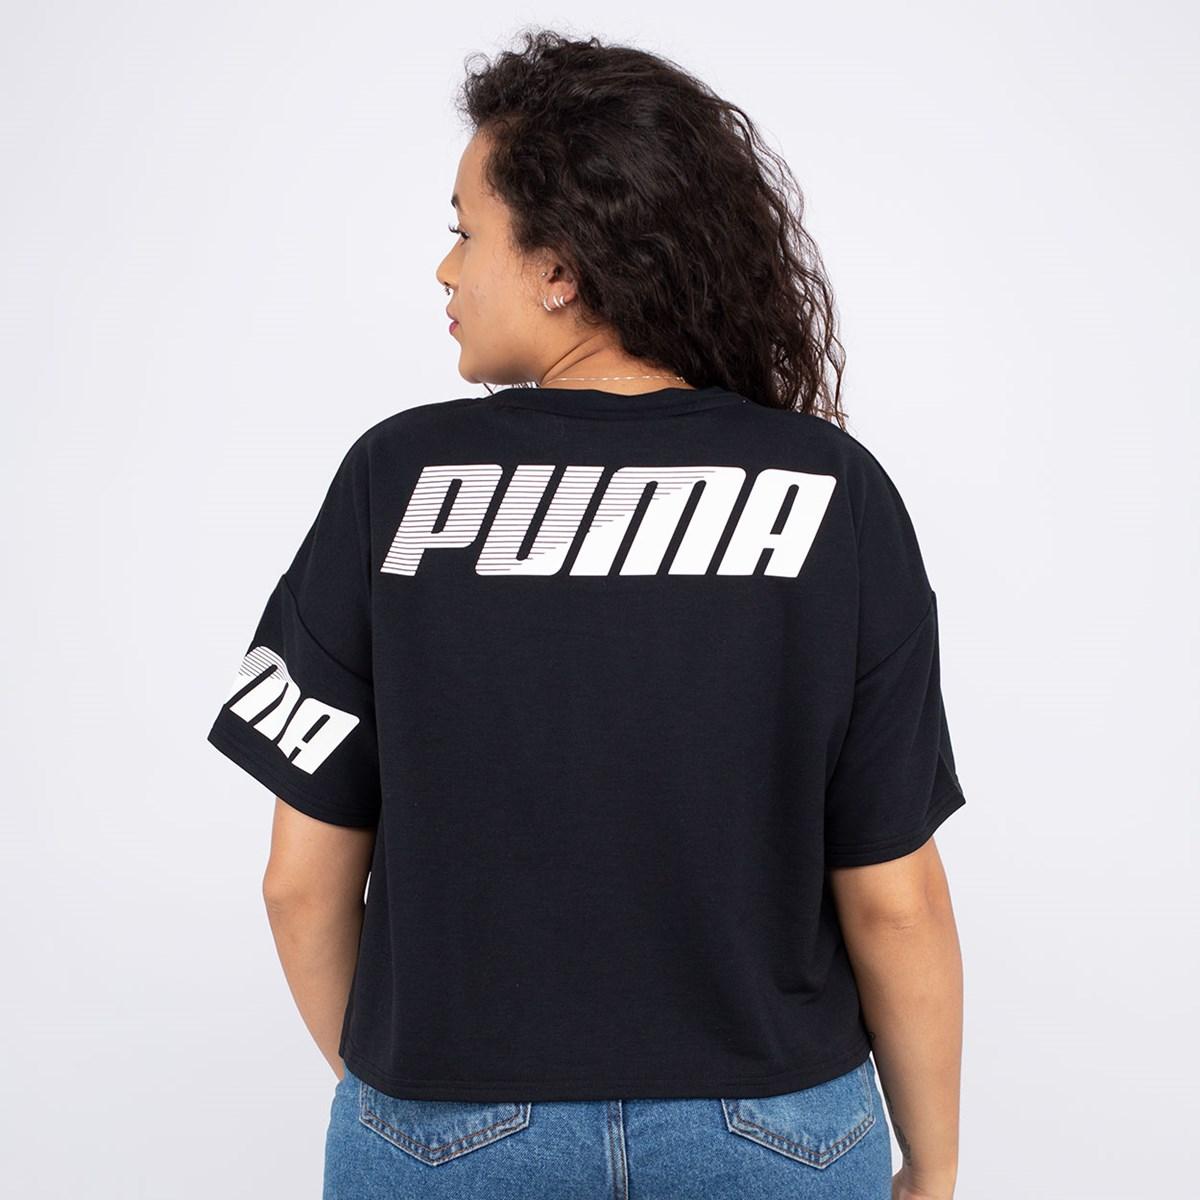 Camiseta Puma Cropped Modern Sport Sweat Tee Black 58039101